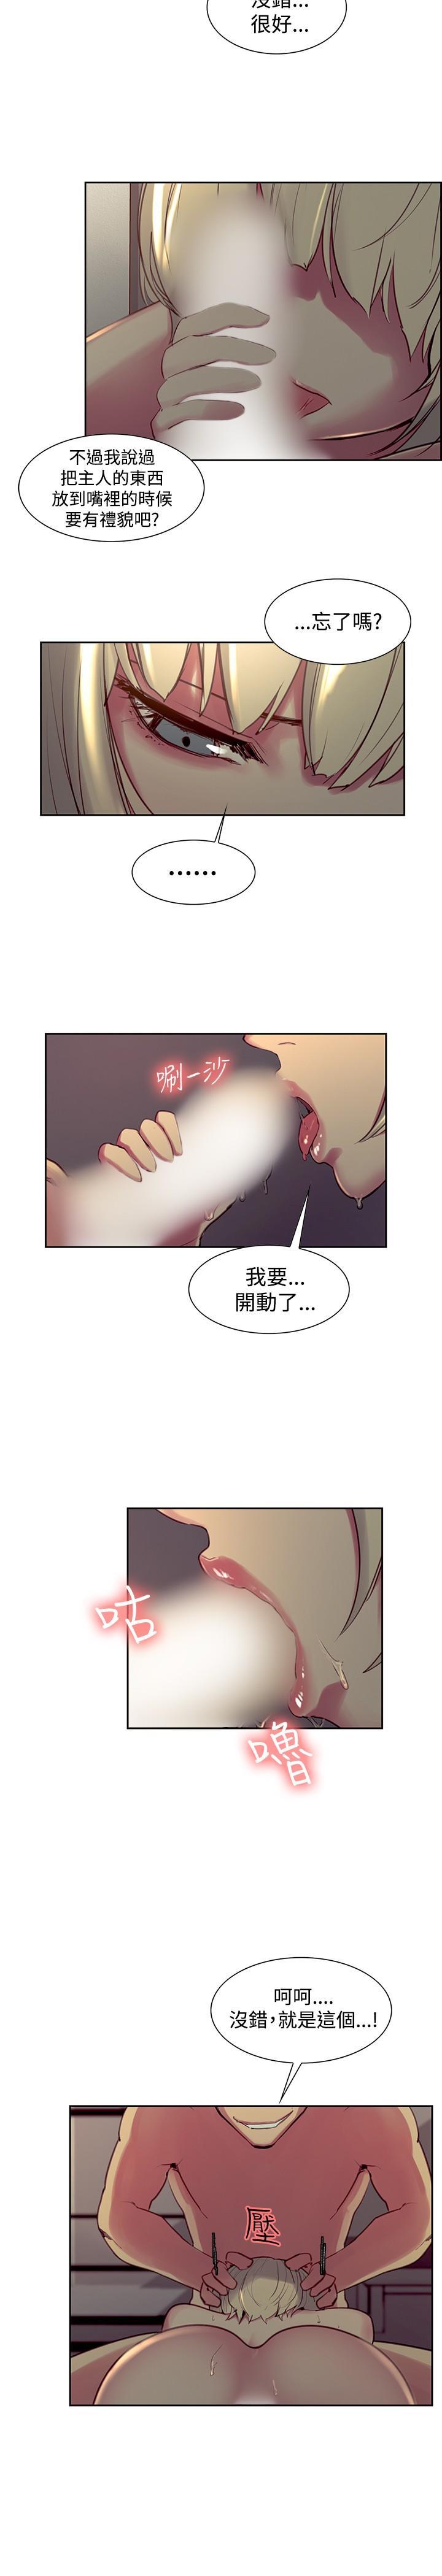 Domesticate the Housekeeper 调教家政妇 ch.29-30 8